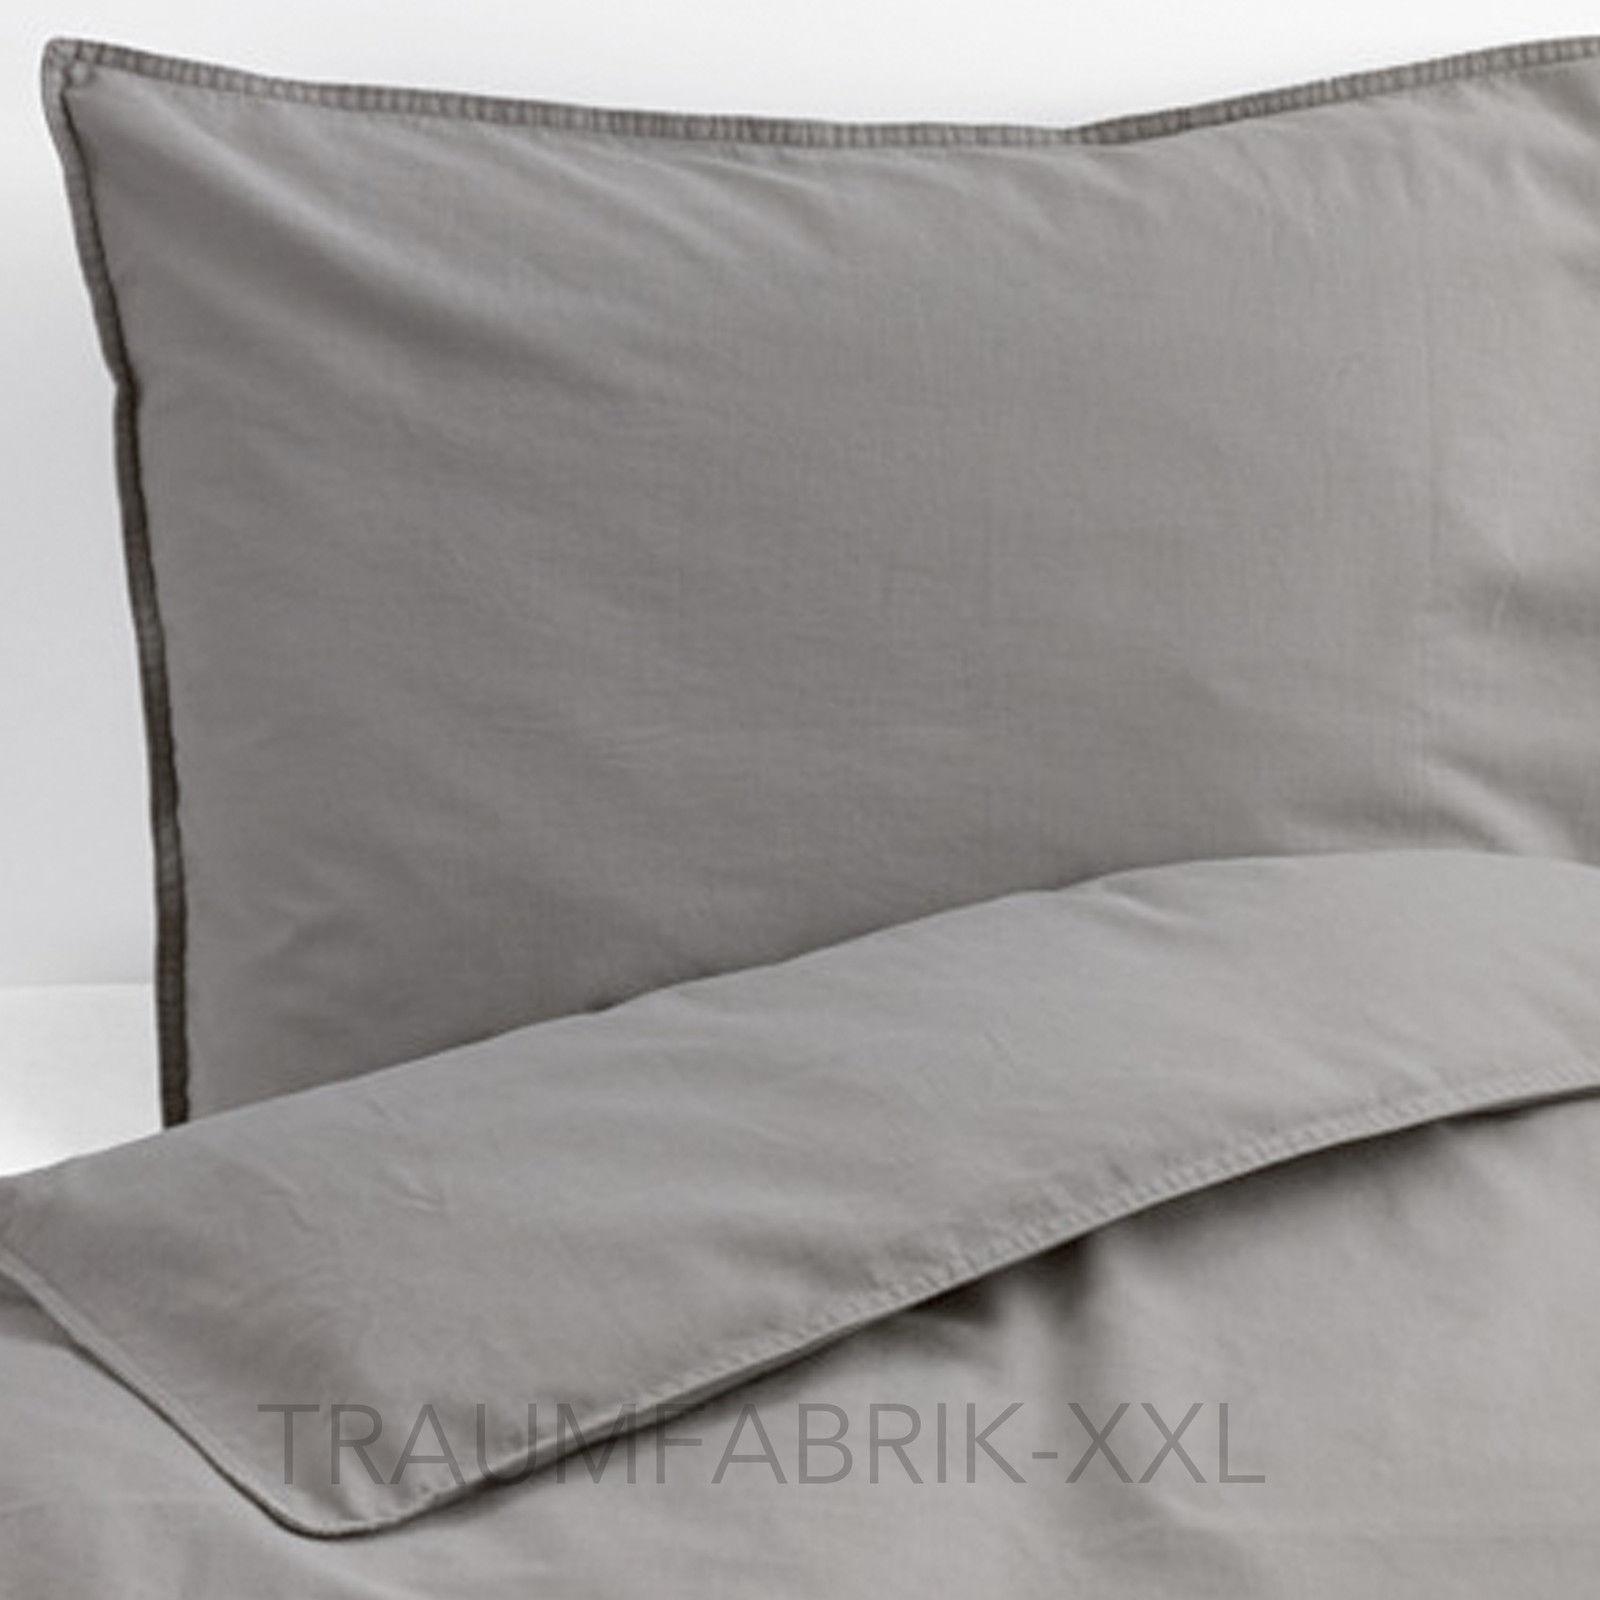 ikea ngslilja bettw sche bettbezug 140 200 cm. Black Bedroom Furniture Sets. Home Design Ideas